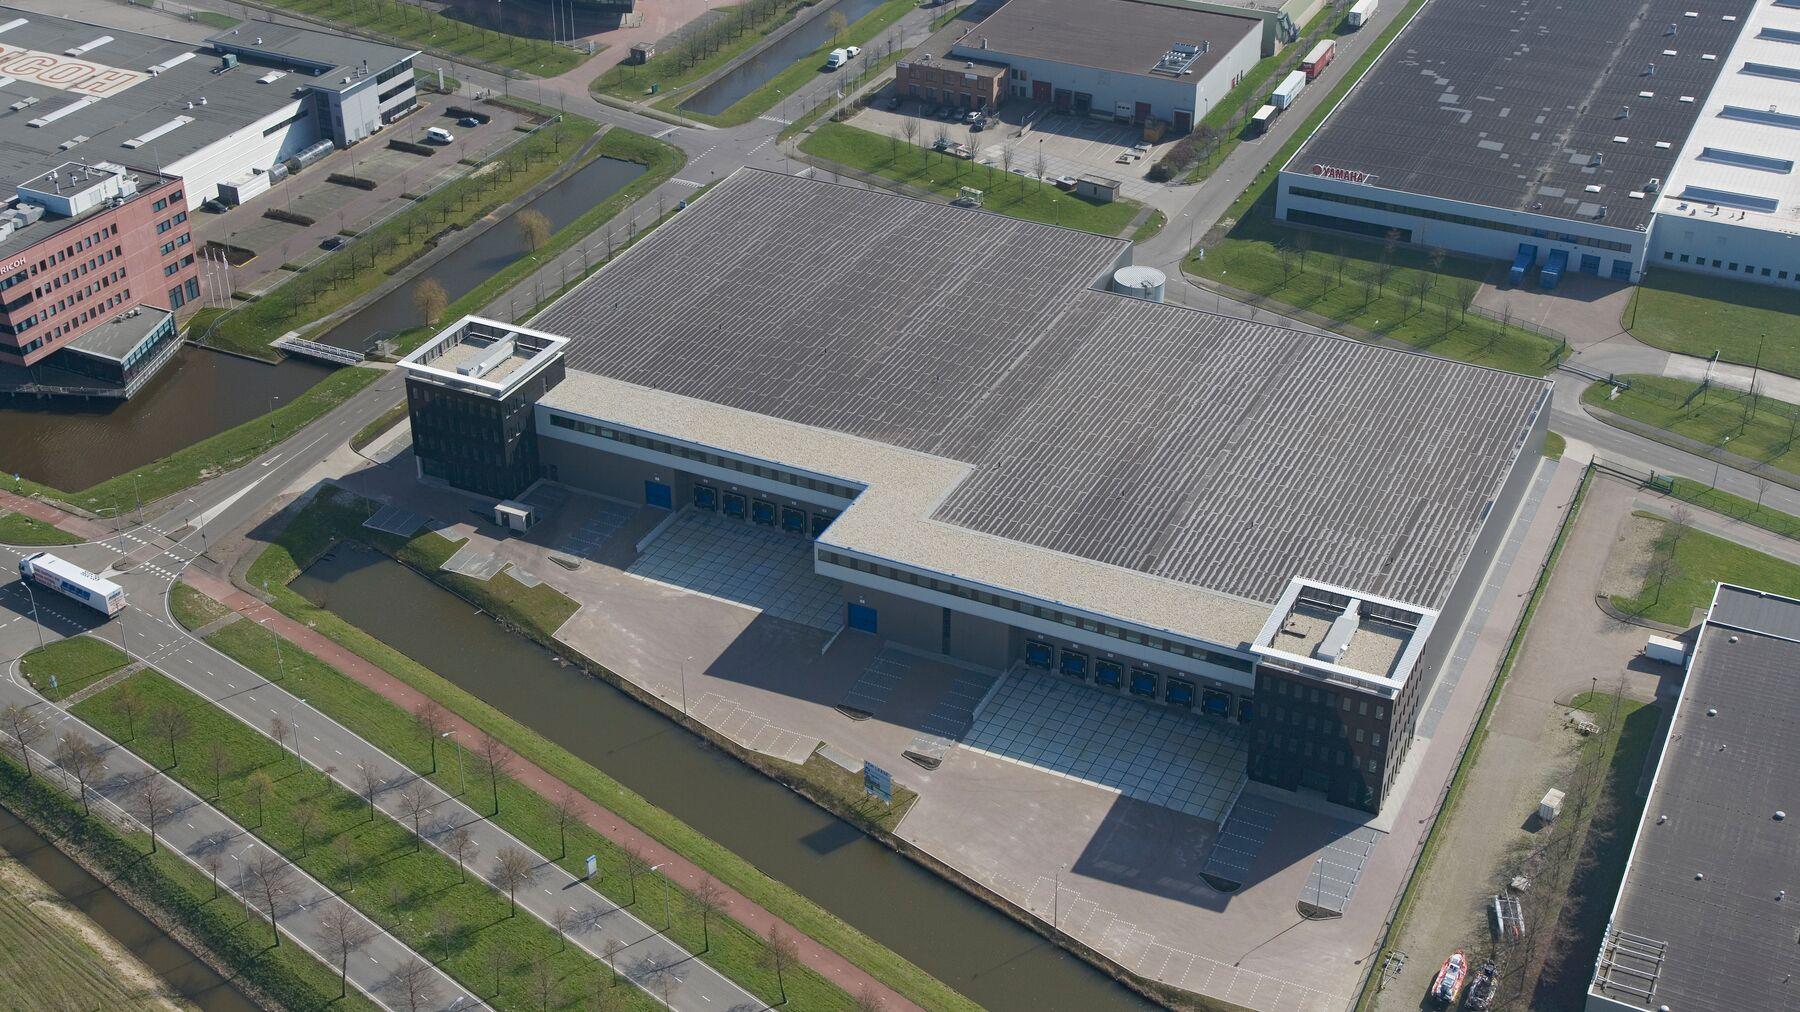 DPM-Prologis-Douglassingel-Aerial.jpg